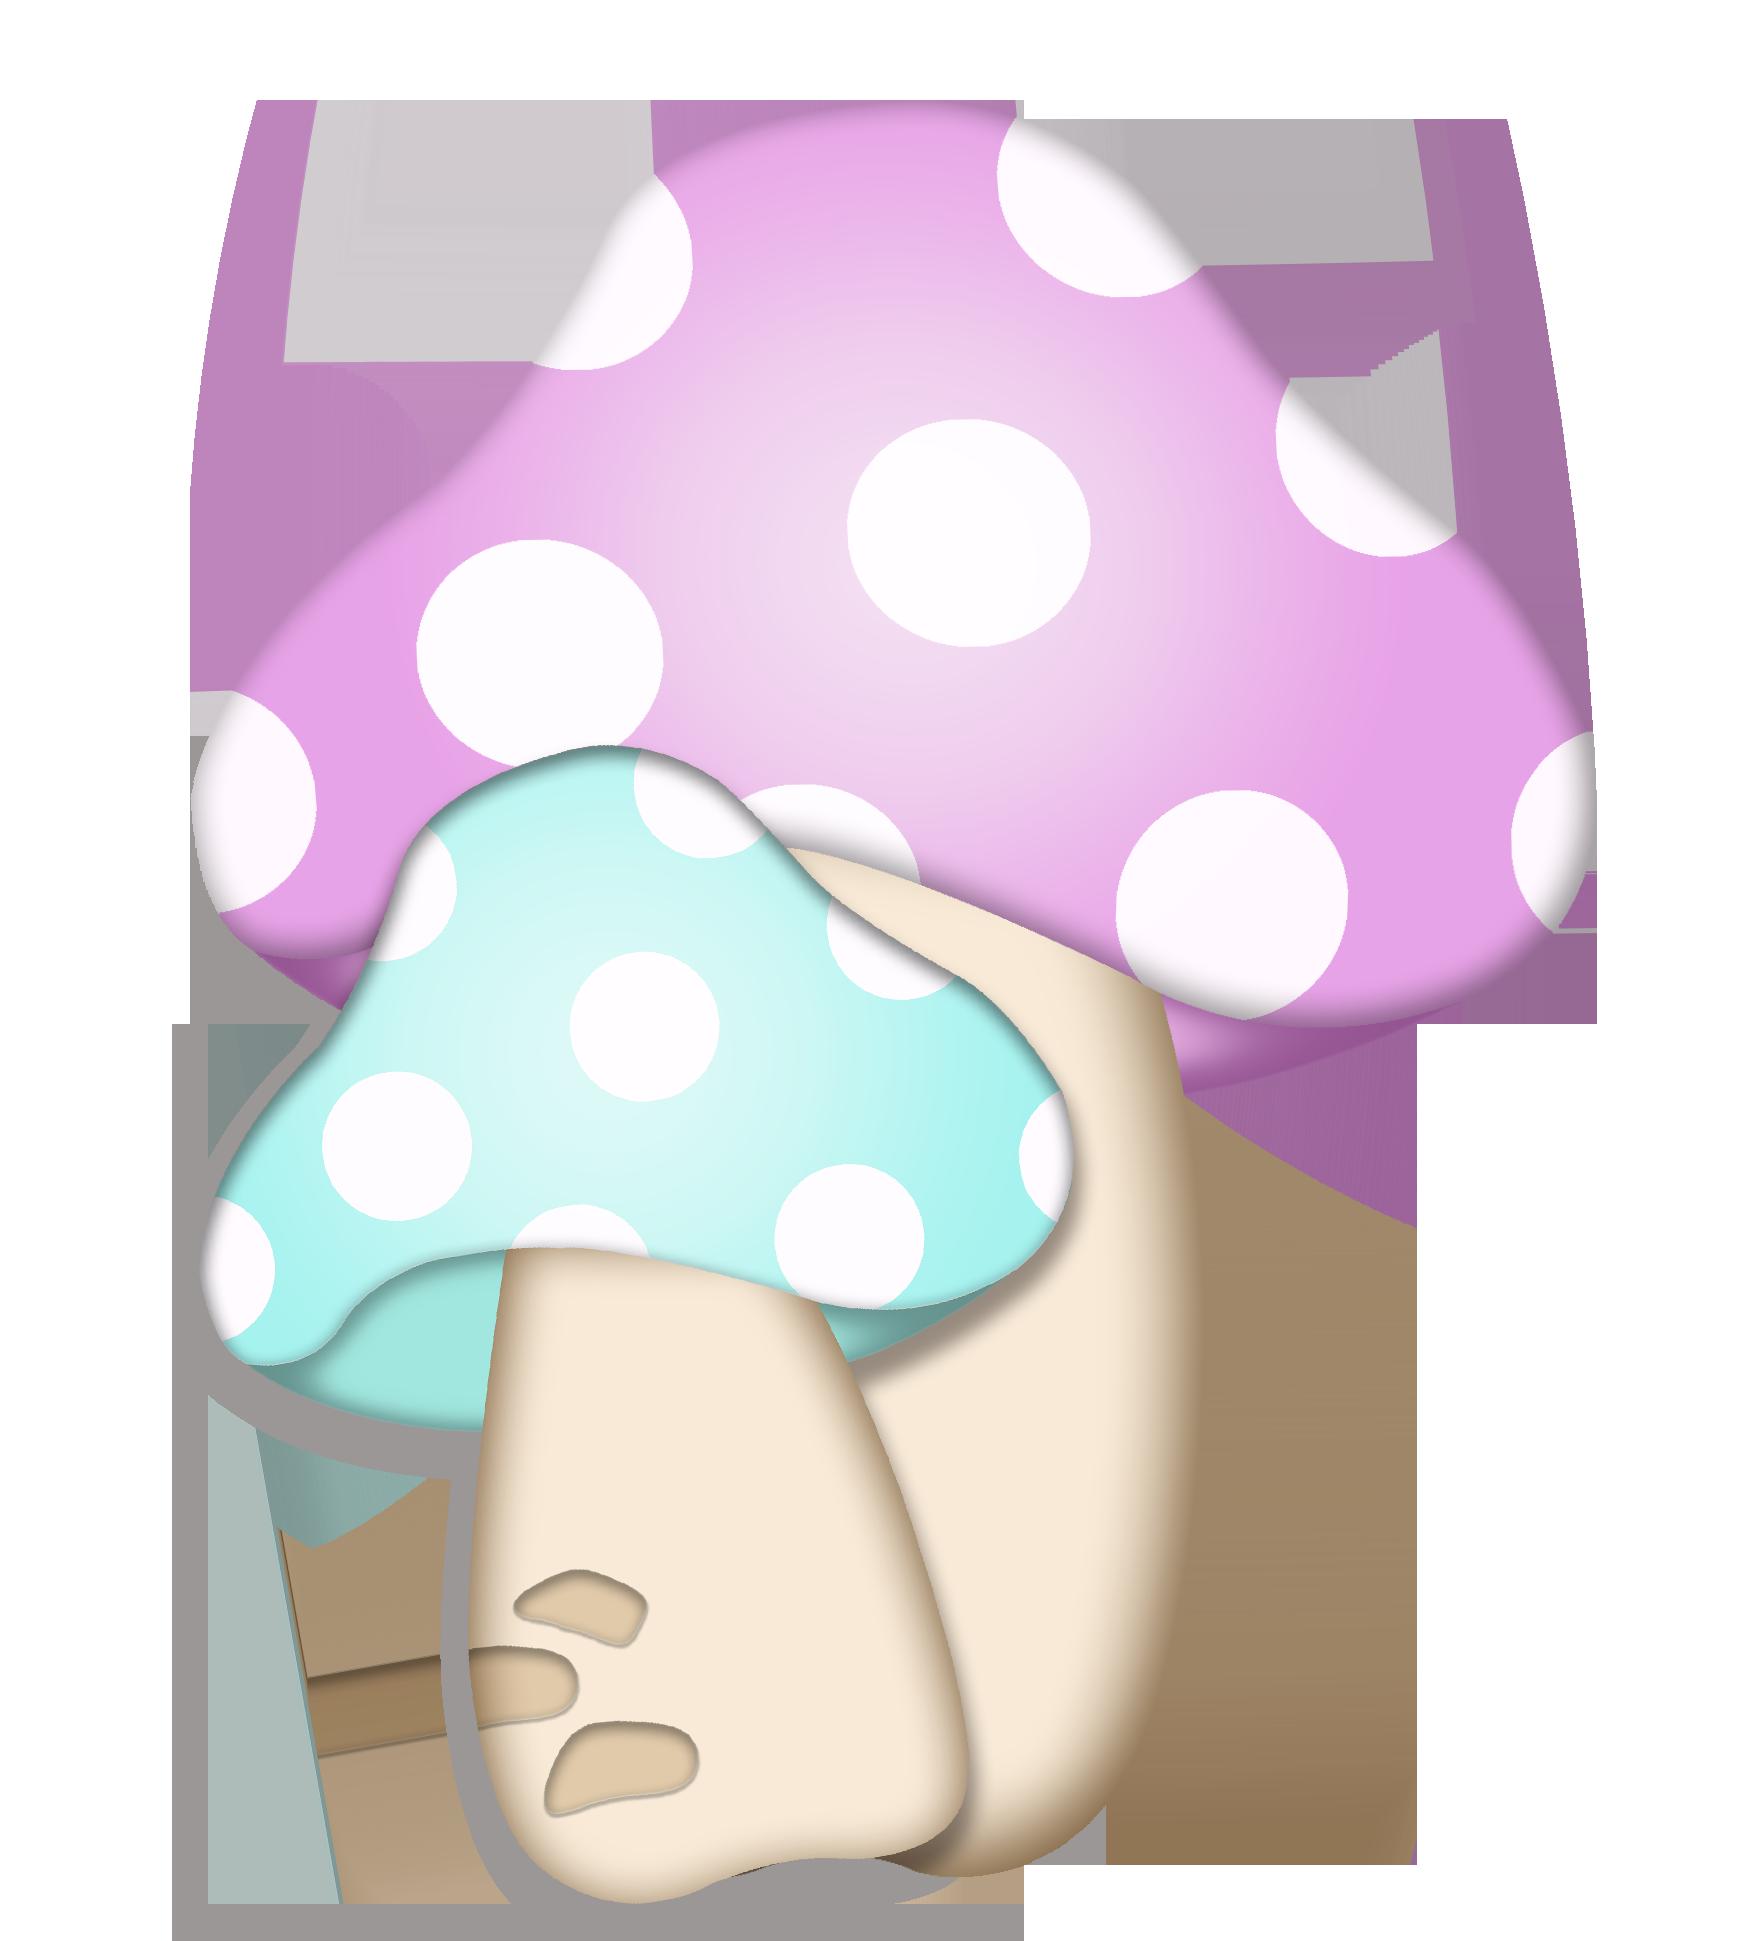 Pin by nasgirneed on. Mushrooms clipart mushroom home